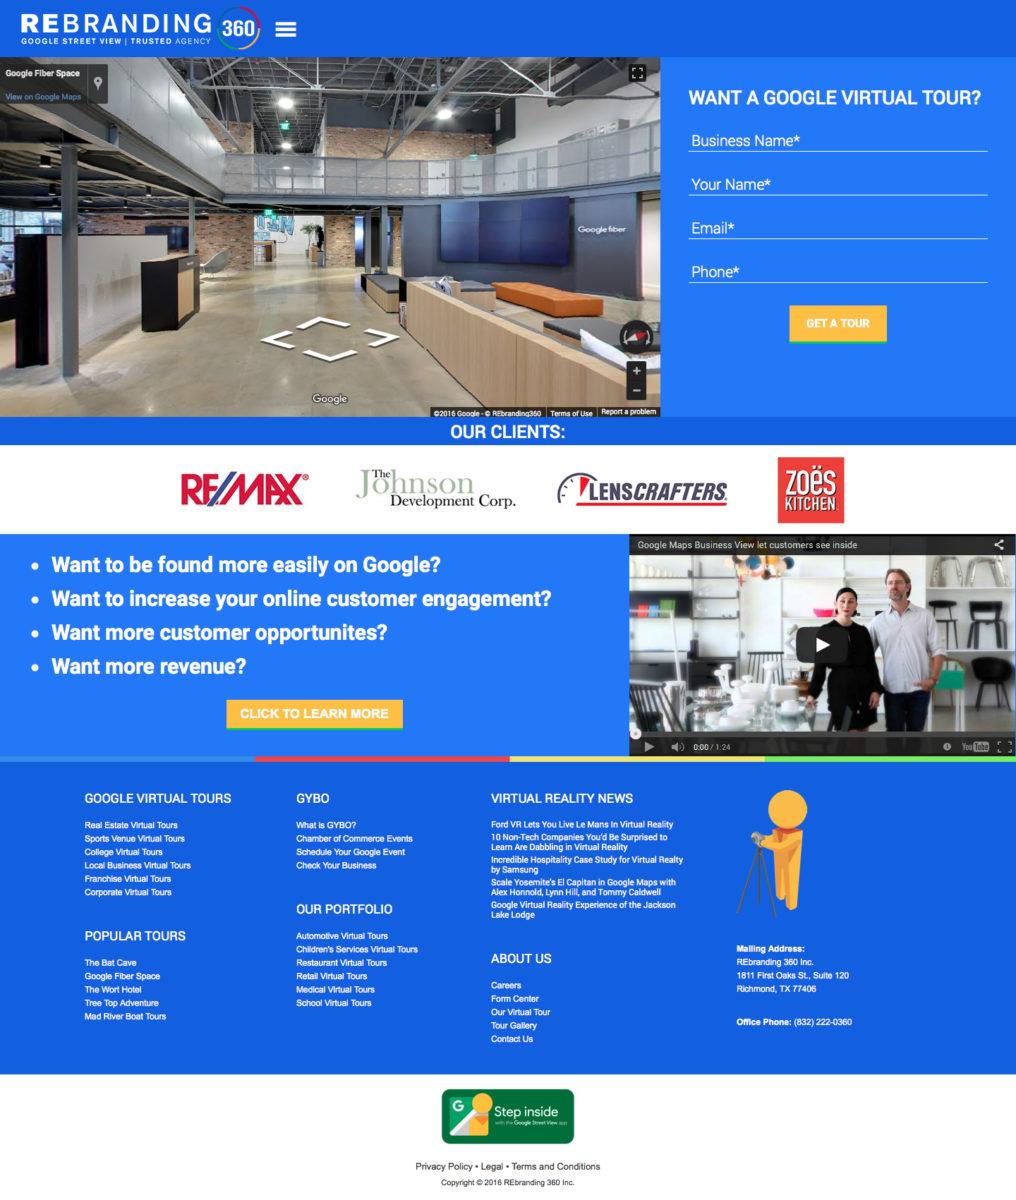 REbranding 360 Web Design